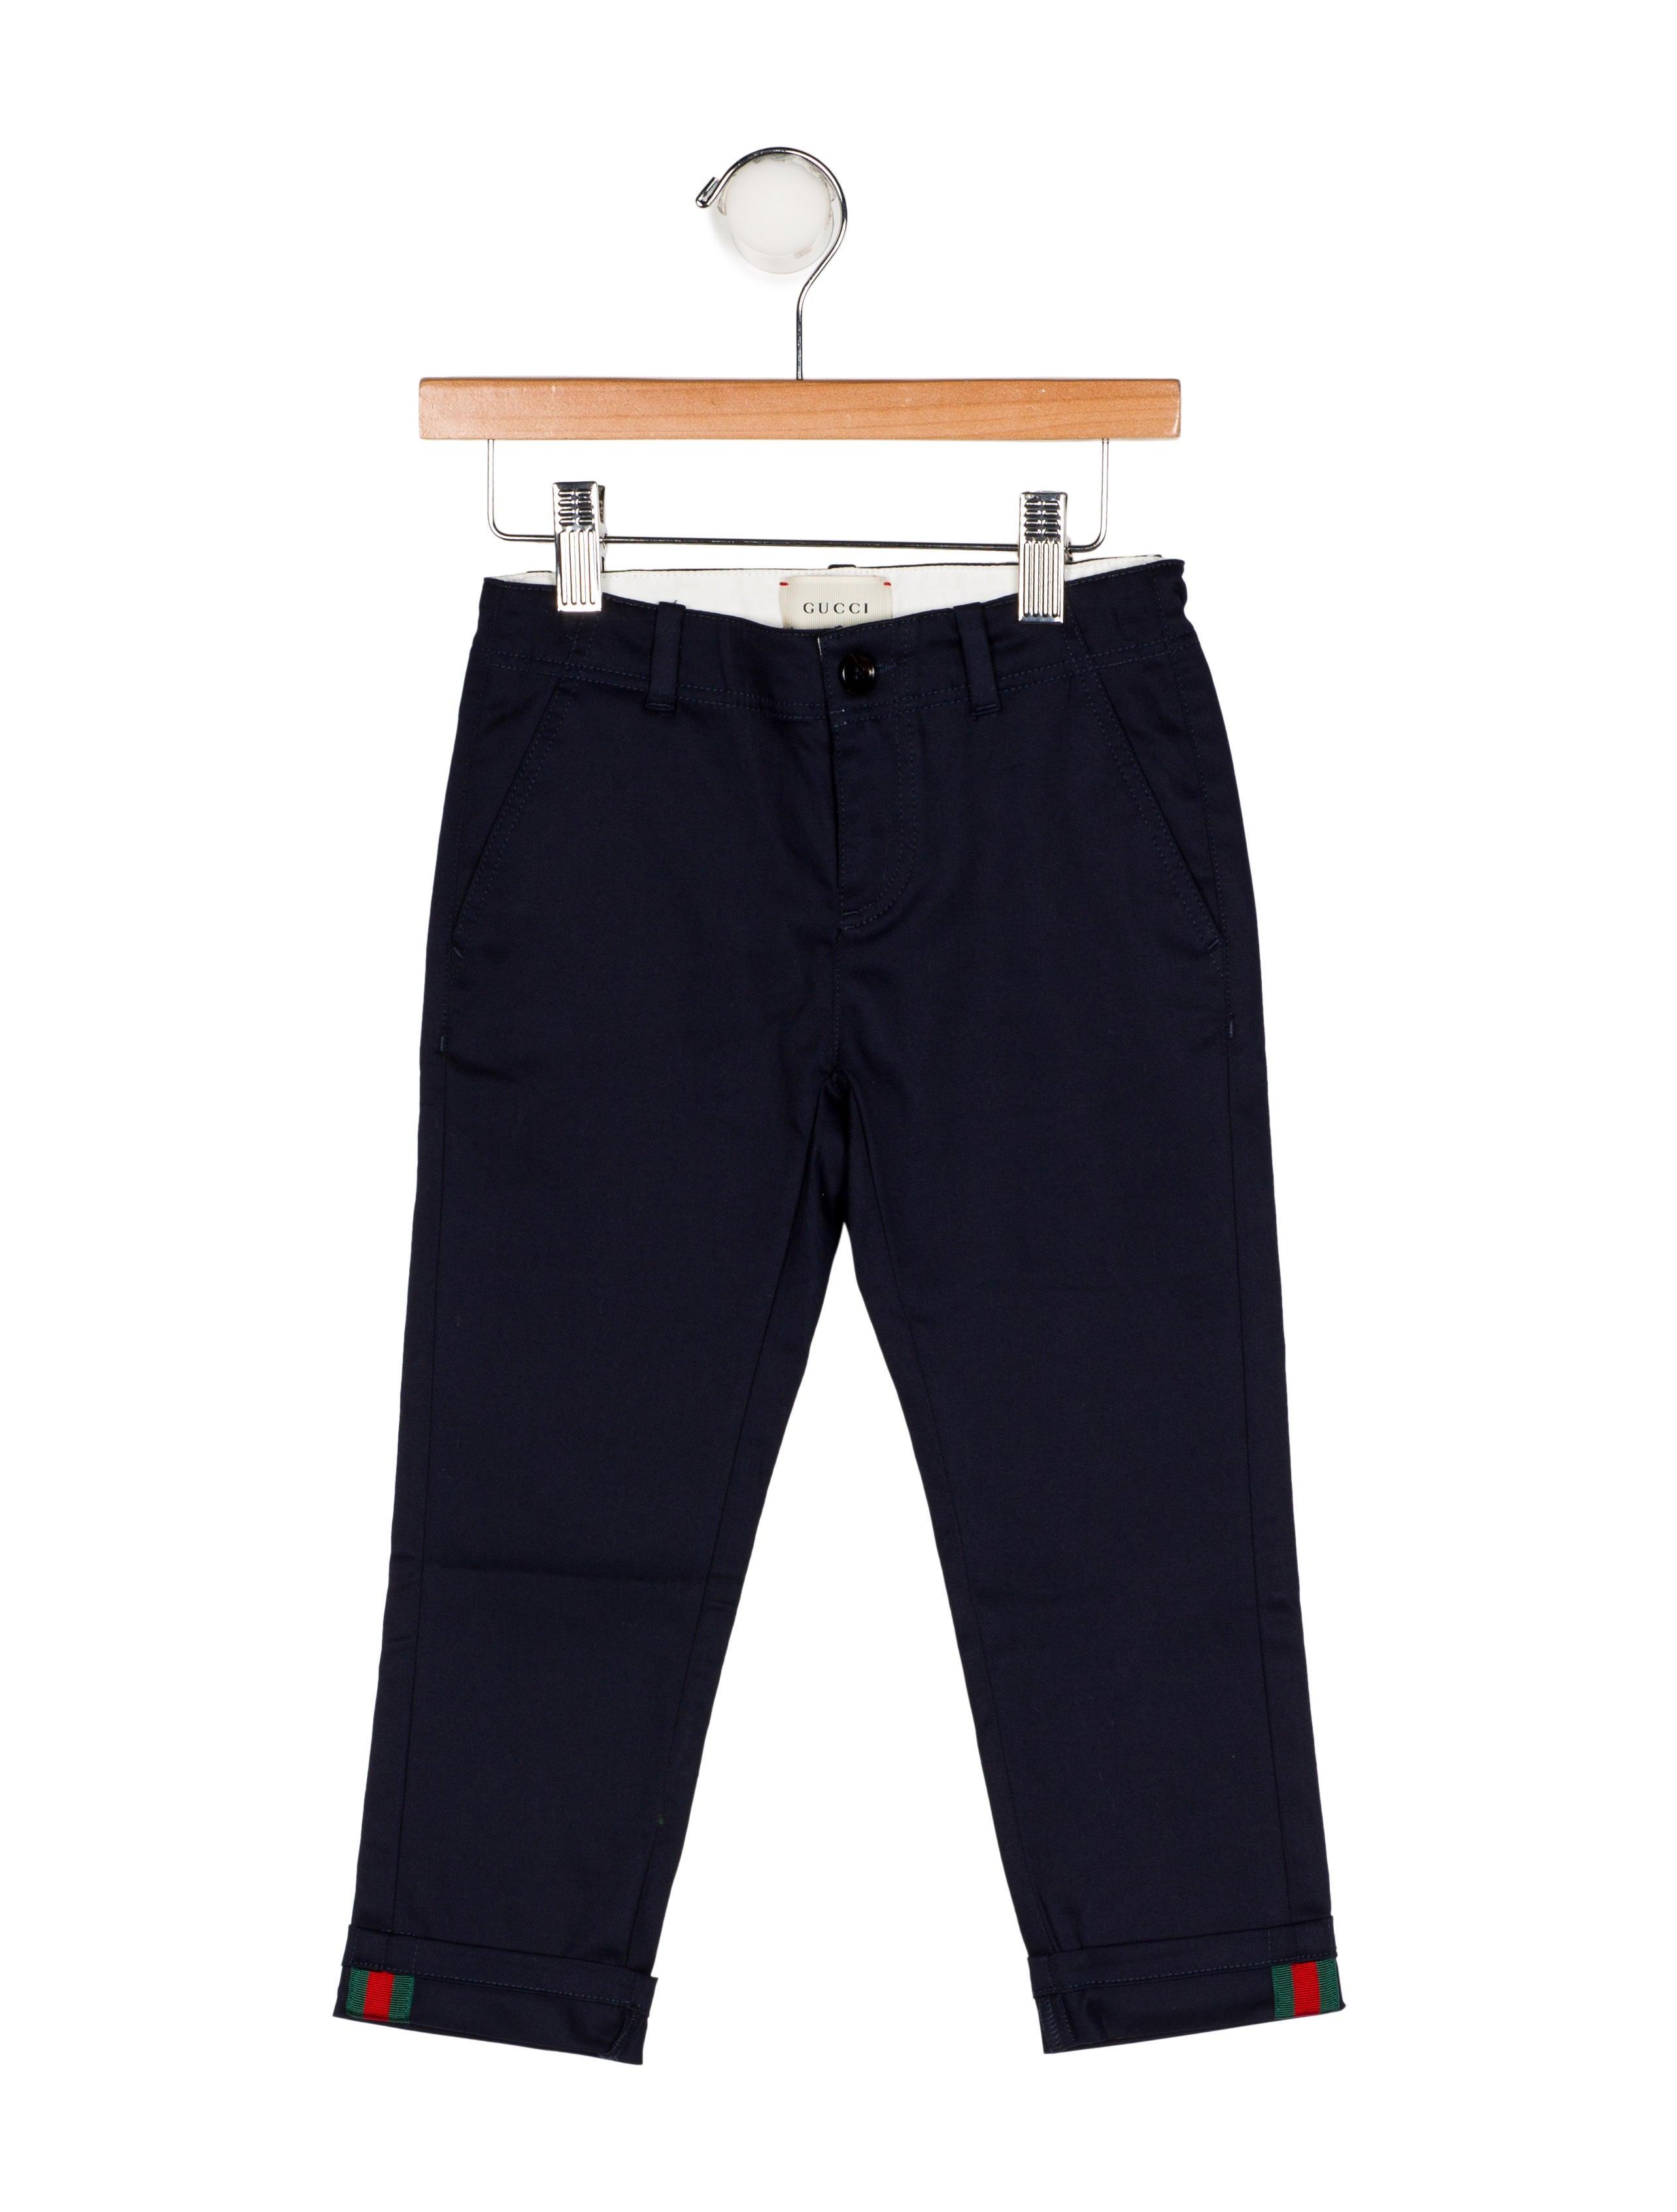 fb04ffc8d Gucci Boys' Woven Straight-Leg Pants w/ Tags - Boys - GUC194709 ...